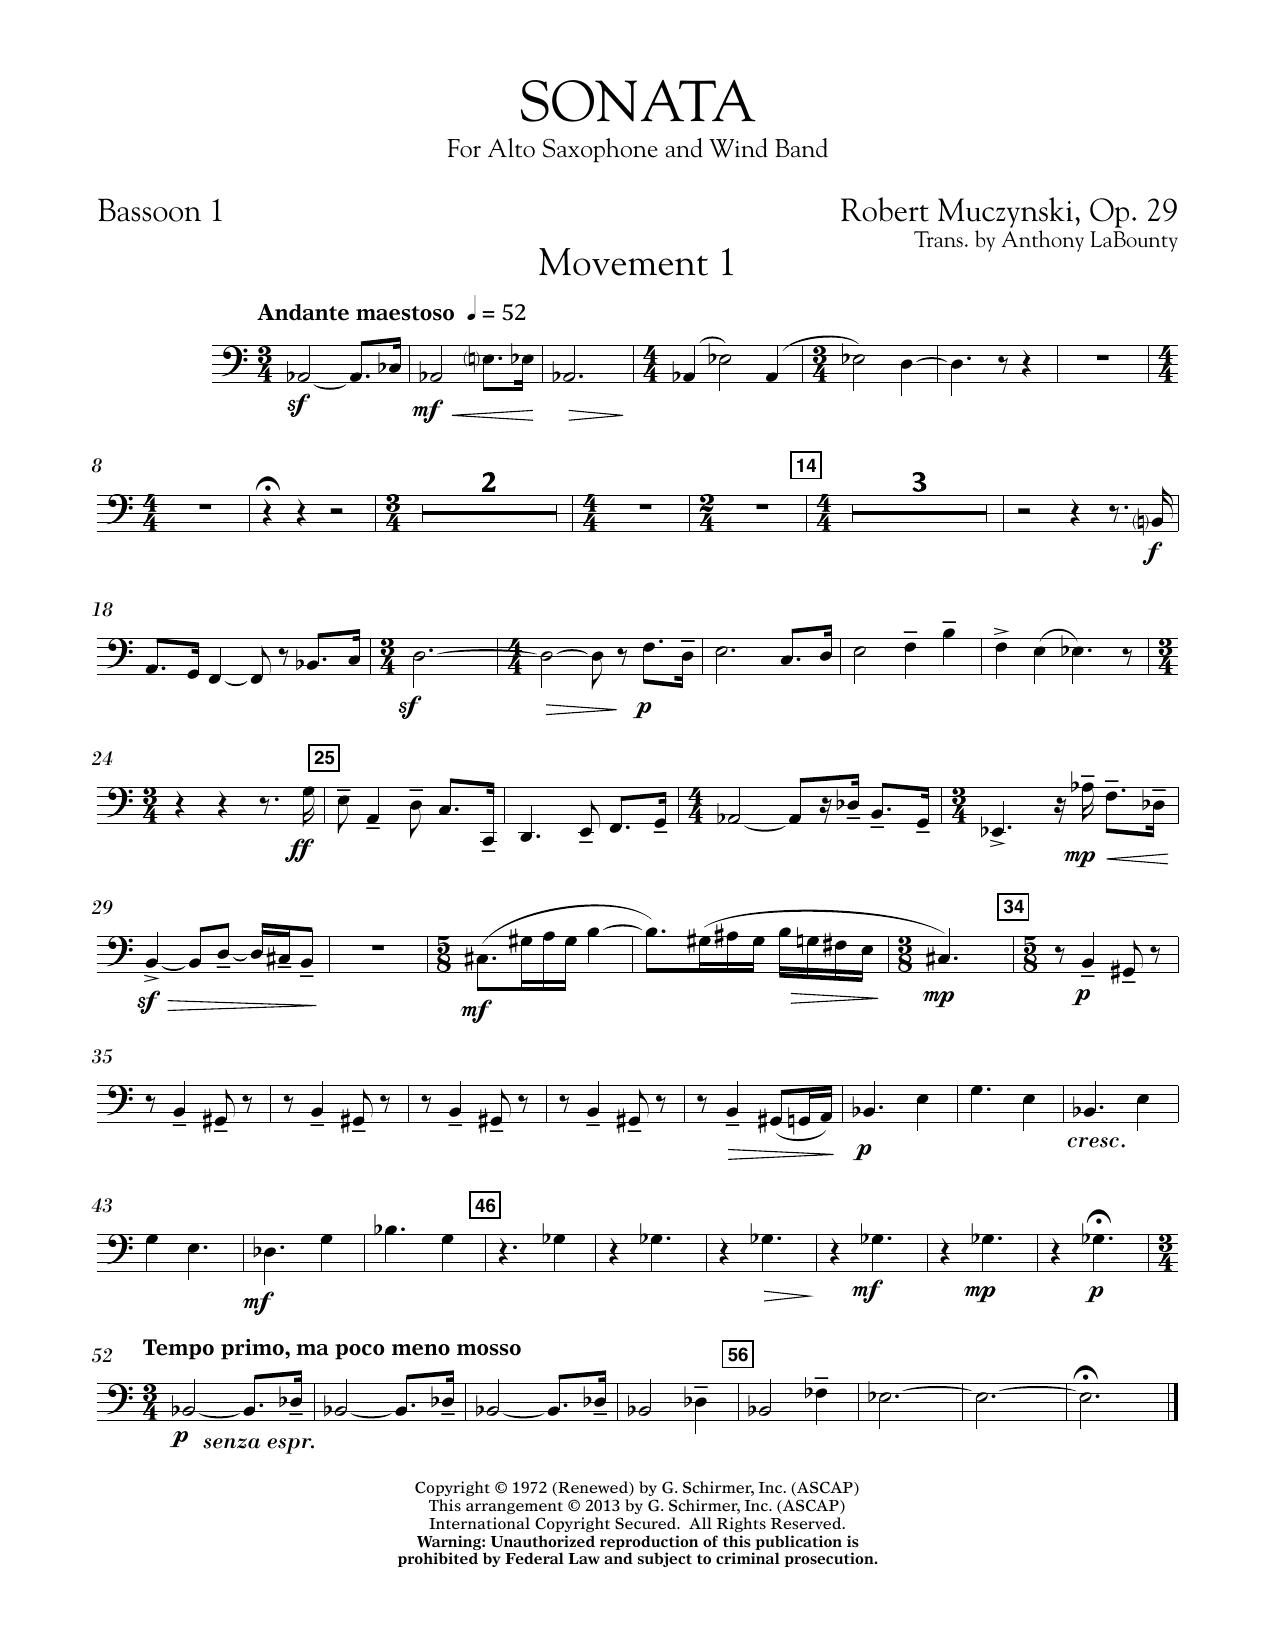 Sonata for Alto Saxophone, Op. 29 - Bassoon 1 (Concert Band)